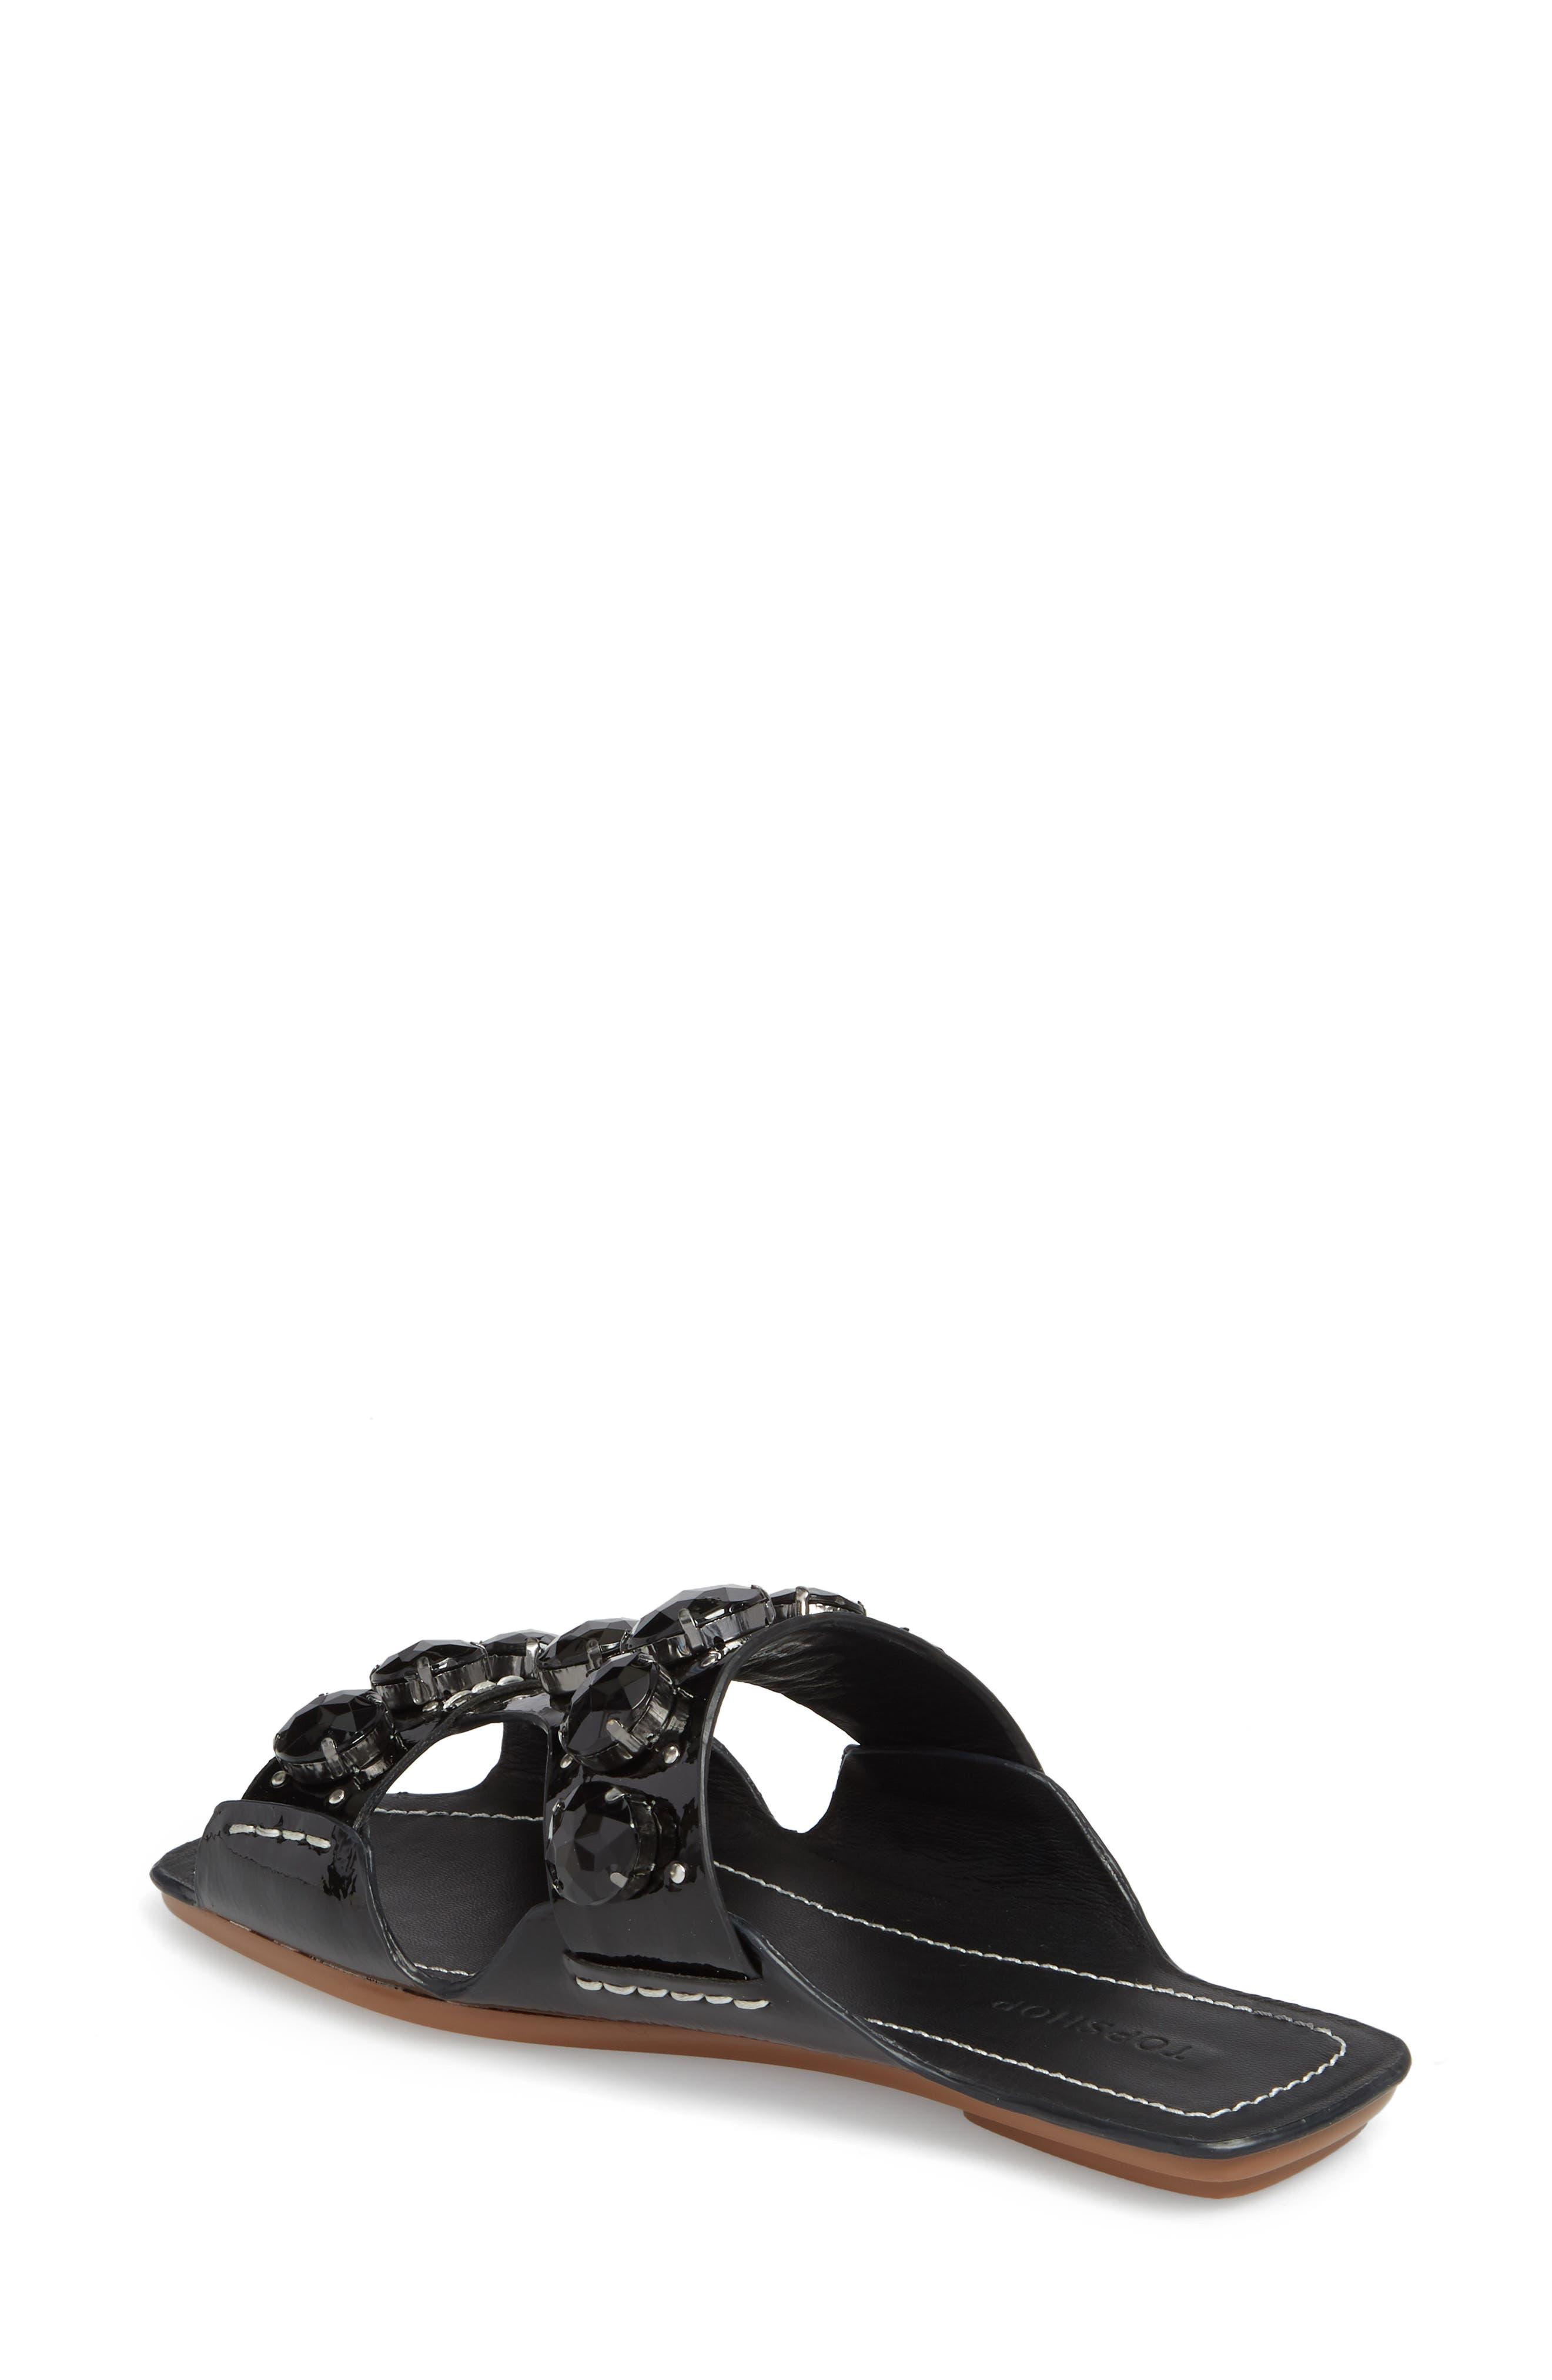 Fascinate Gem Slide Sandal,                             Alternate thumbnail 2, color,                             BLACK